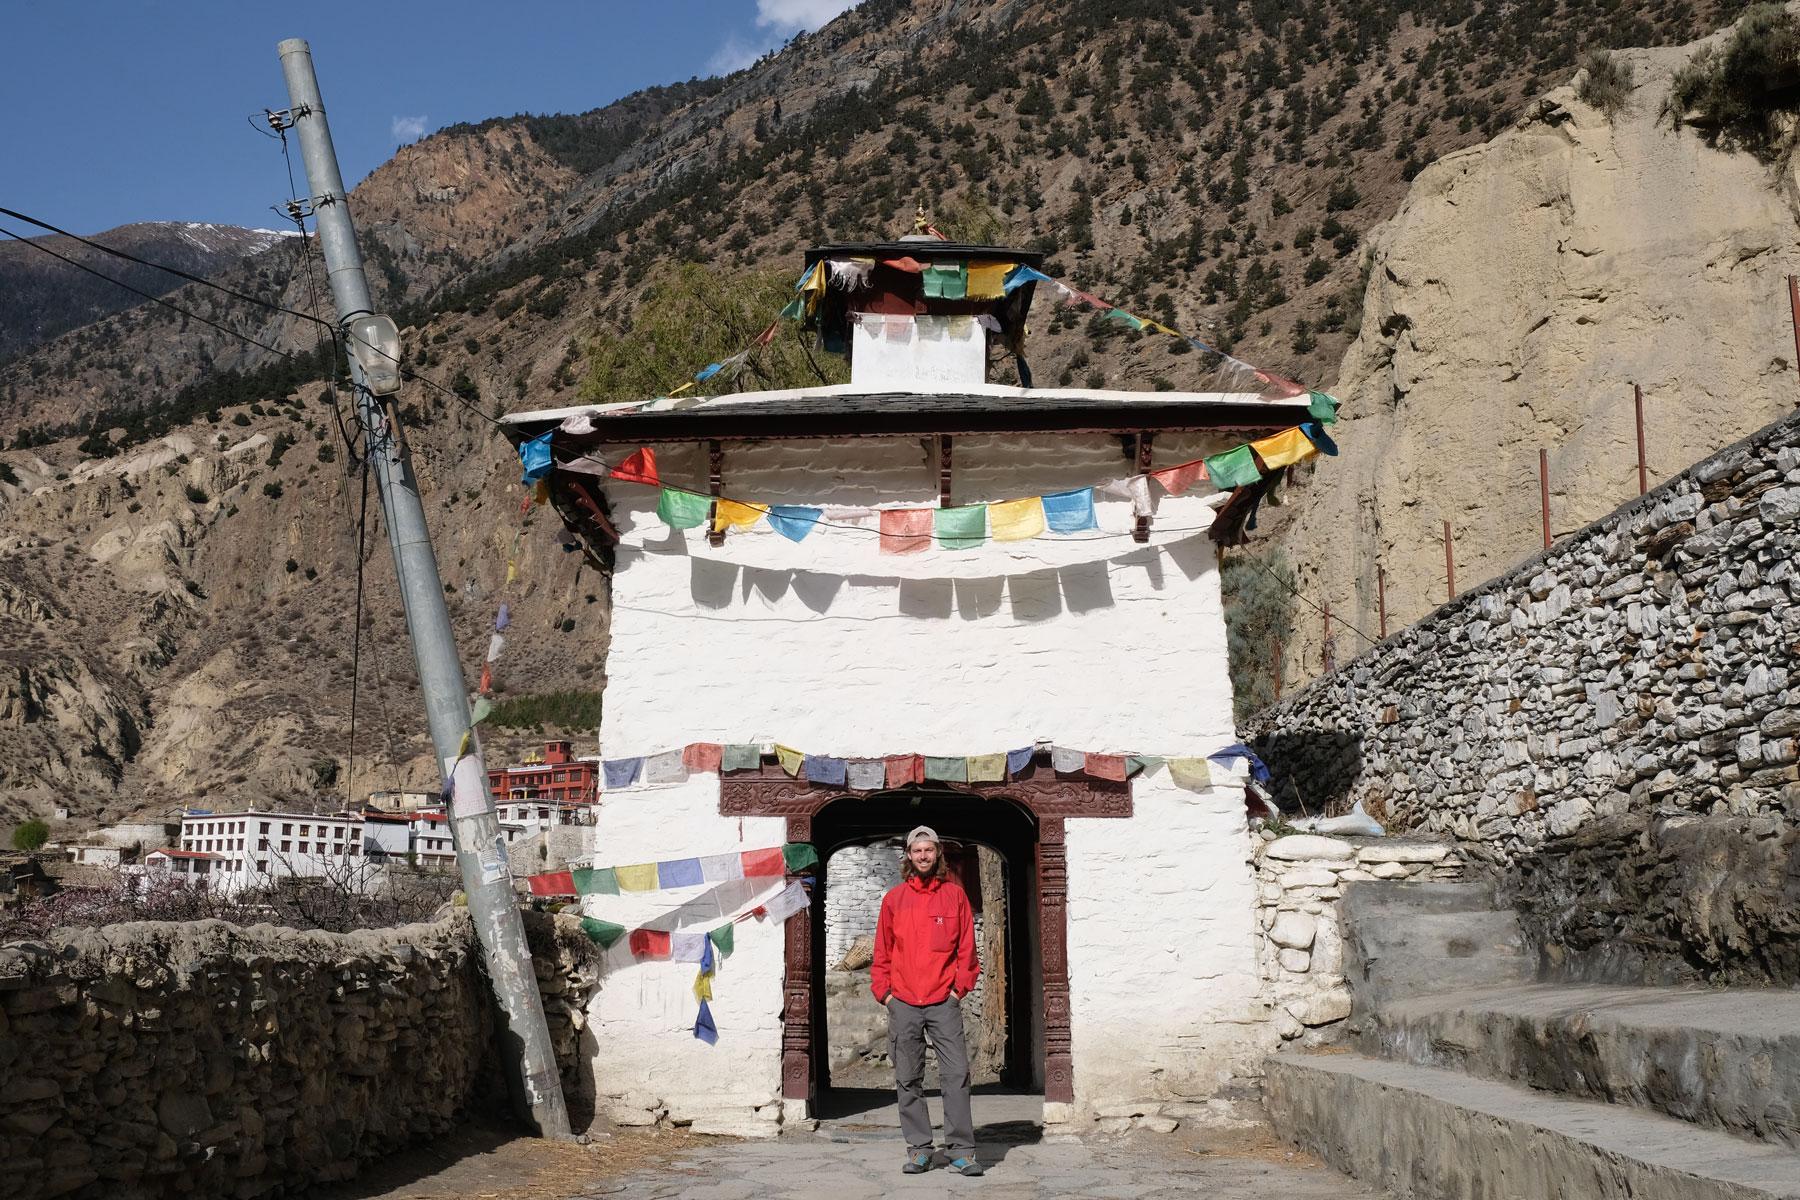 Sebastian vor dem Eingangstor des Dorfs Marpha auf dem Annapurna Circuit.